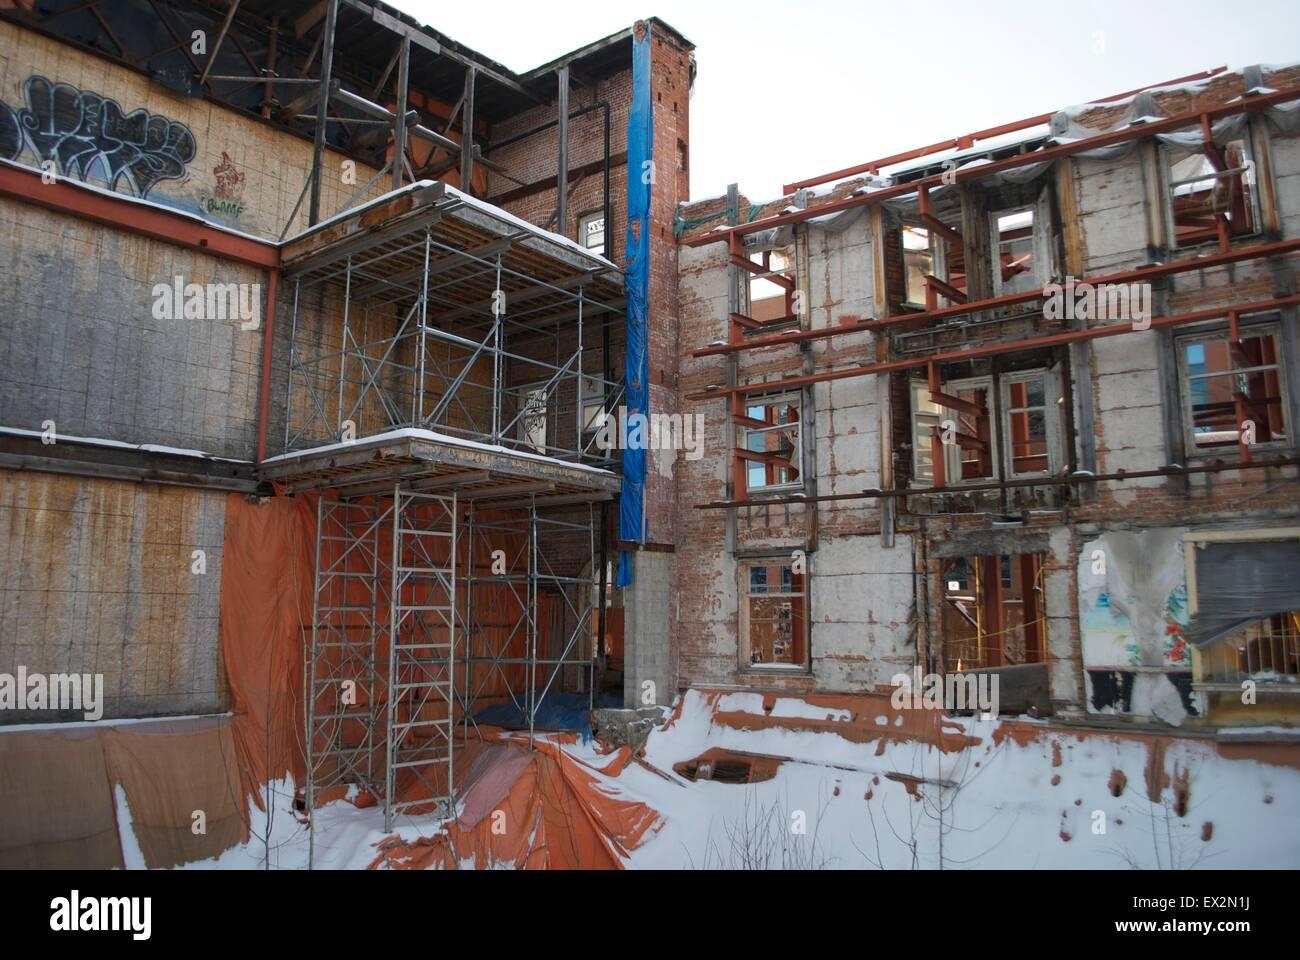 building in disrepair ottawa - Stock Image